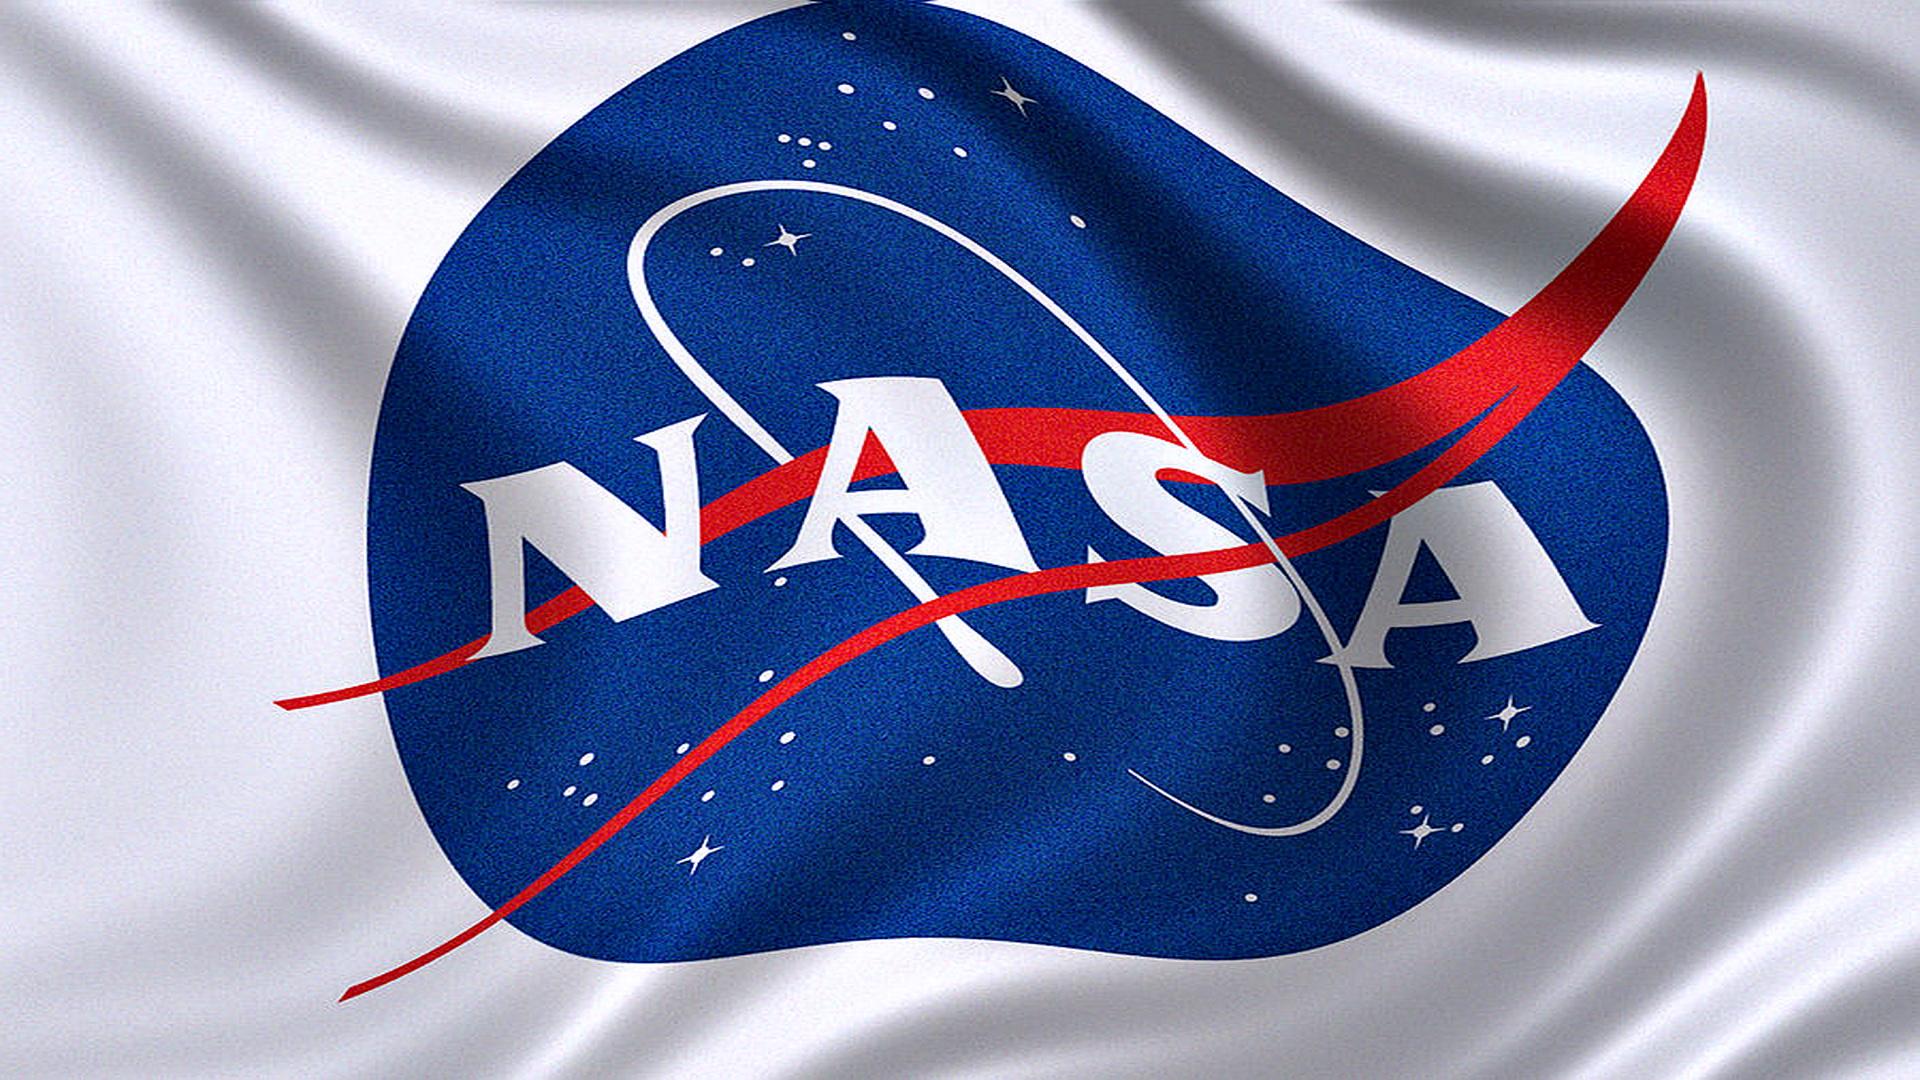 nasa space flag - photo #5